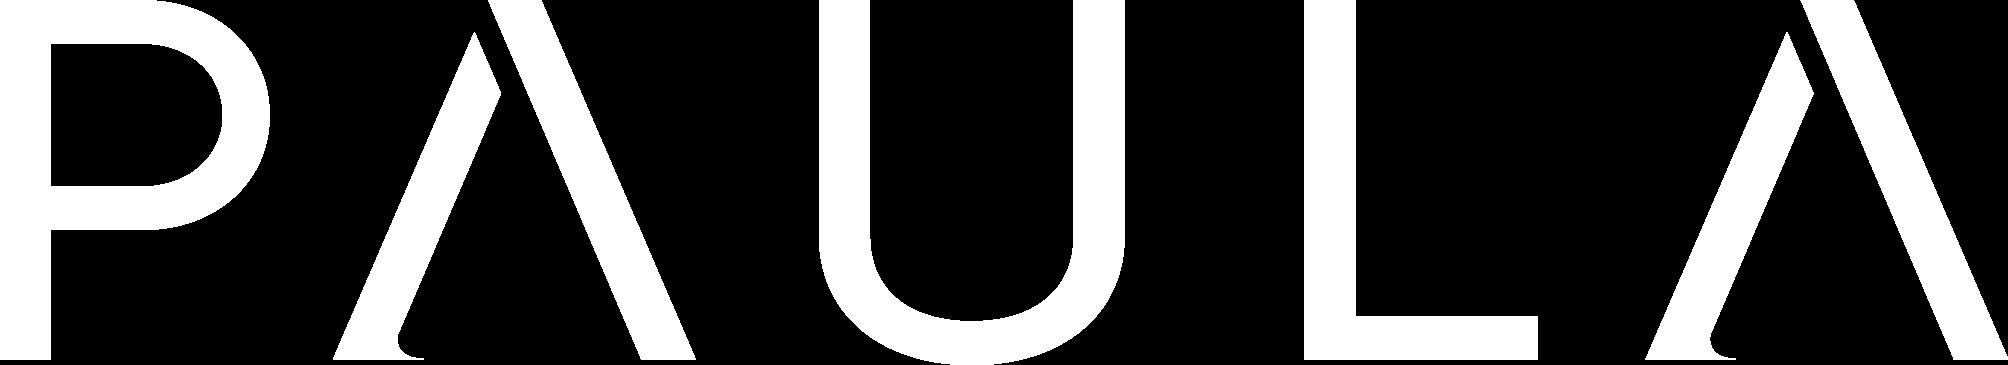 Paula logo